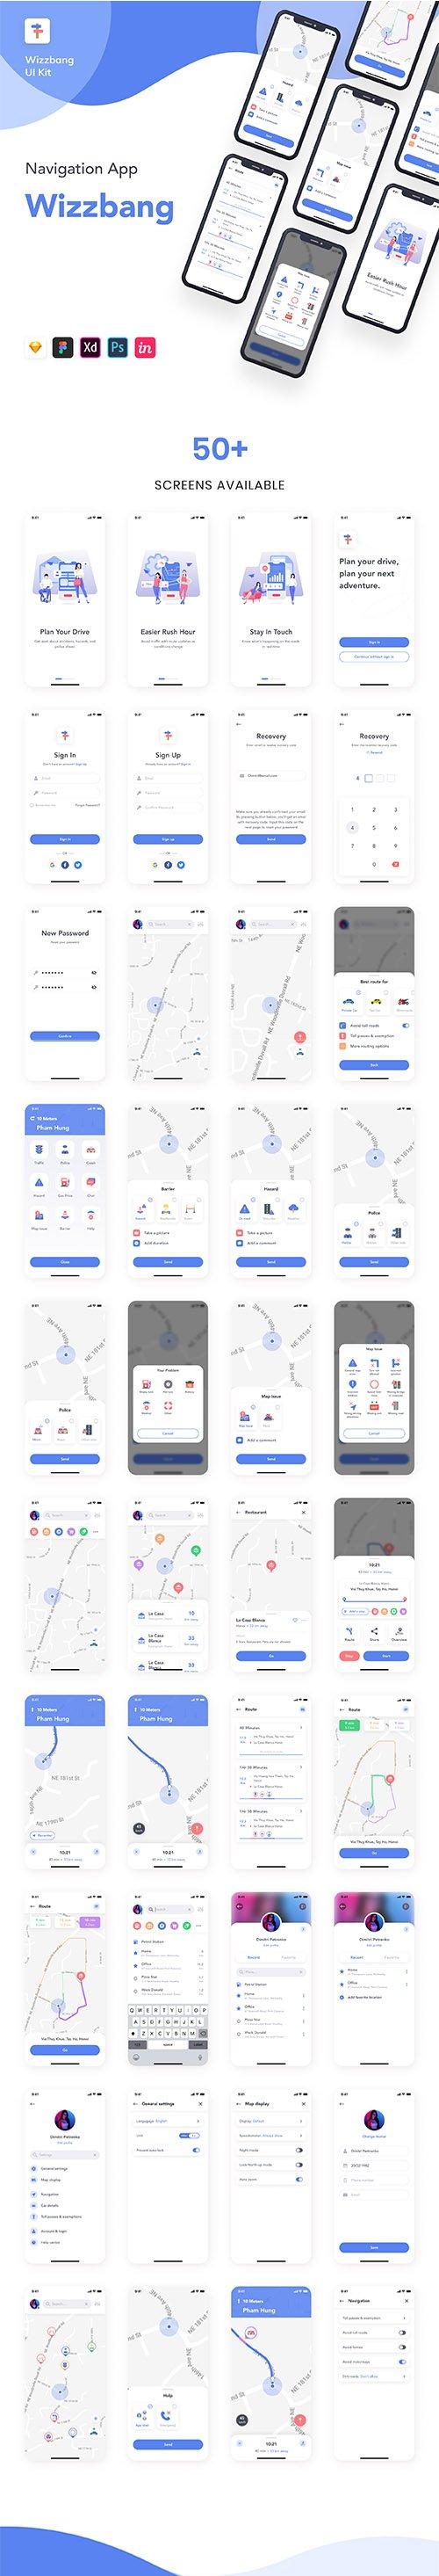 Wizzbang - Navigation App UI Kit